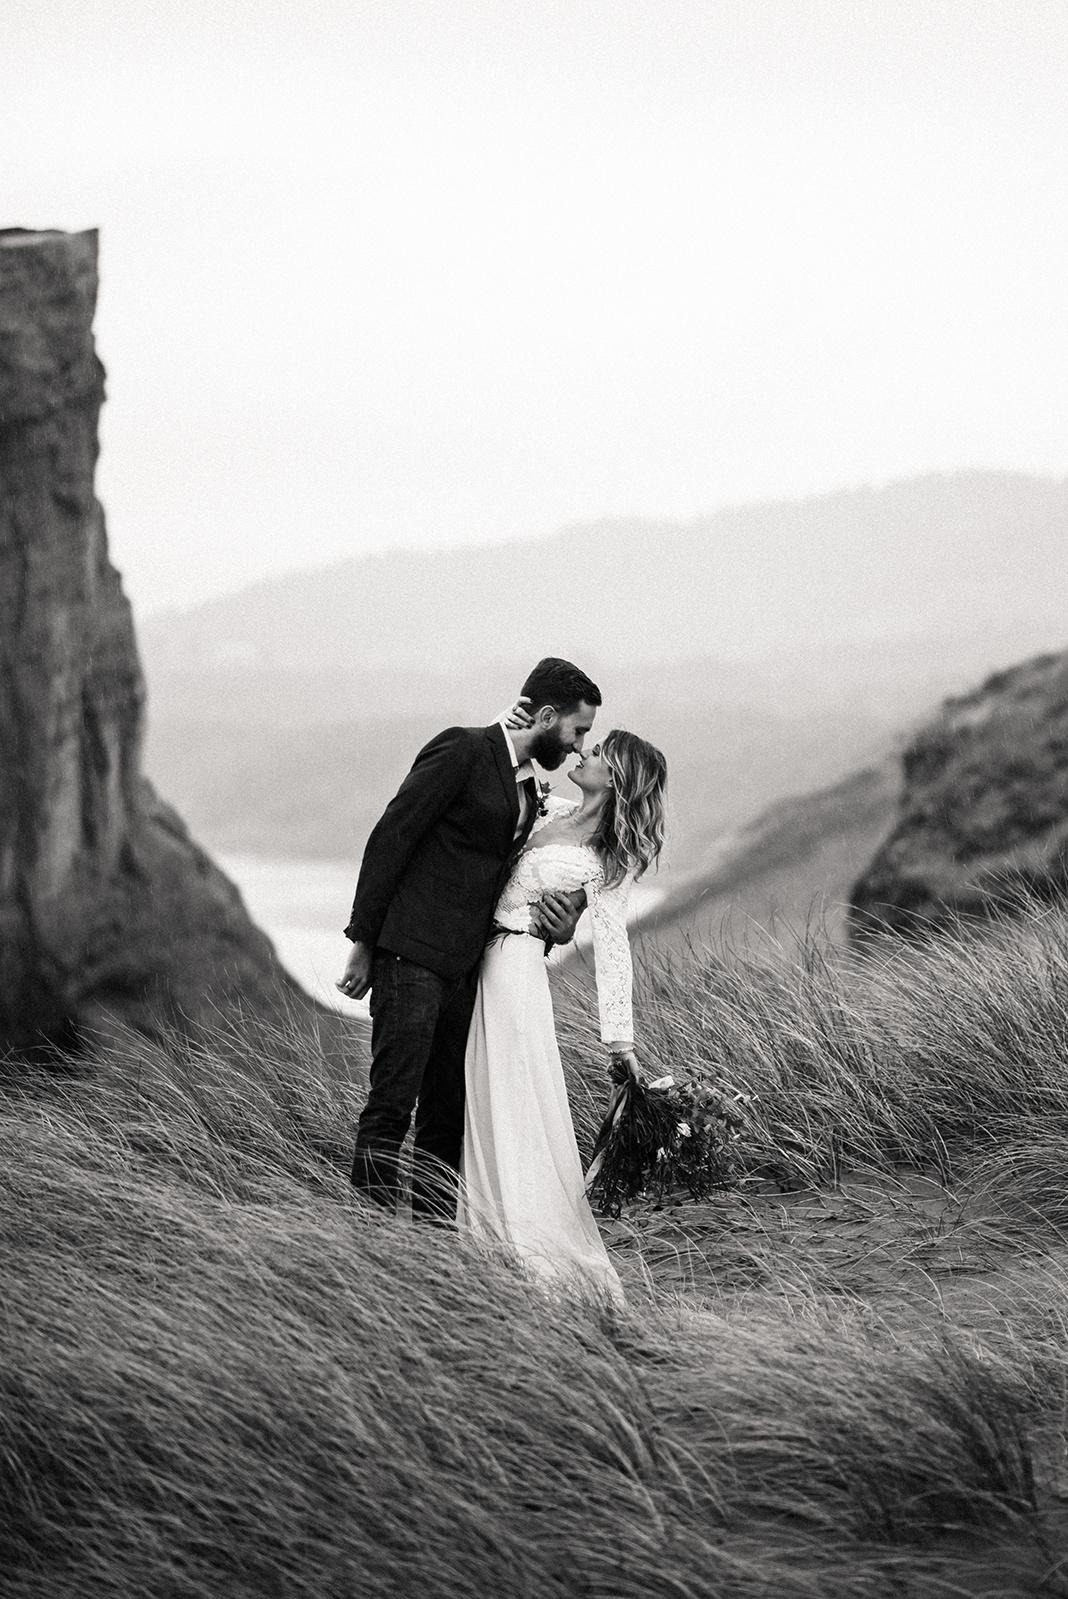 Oregon_Coast_Elopement_Wedding_The_Foxes_Photography_100.jpg